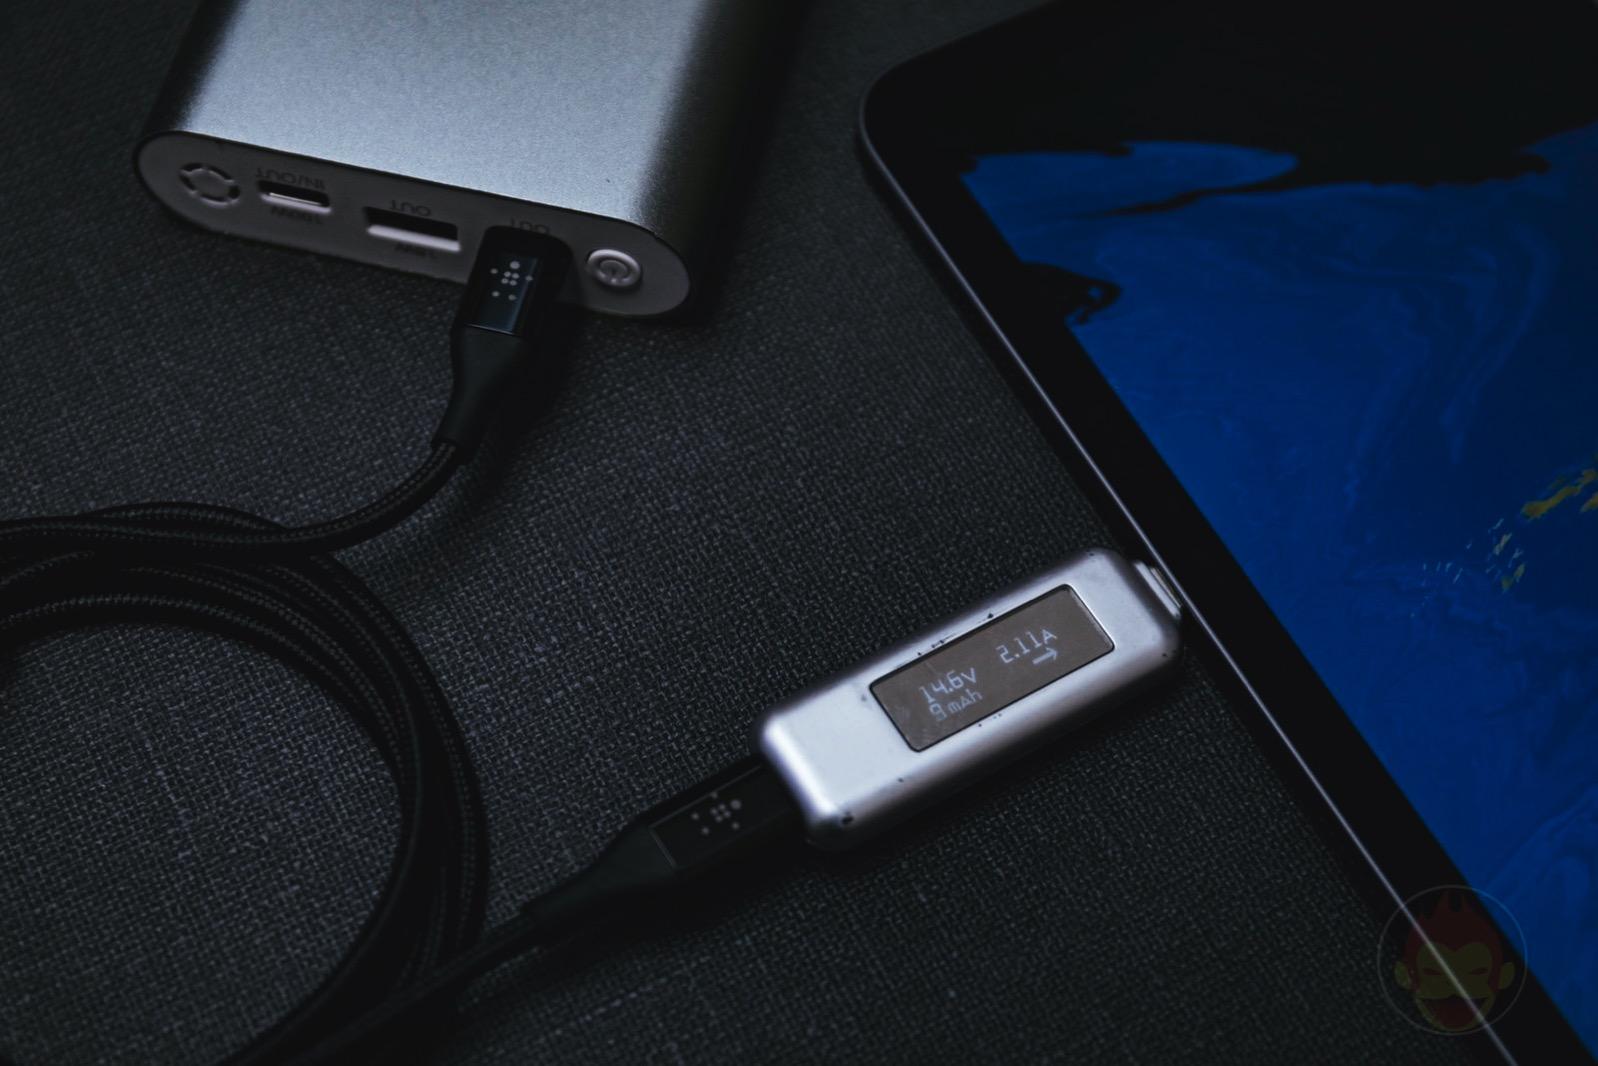 HyperJuice-100W-Mobile-Battery-Review-13.jpg